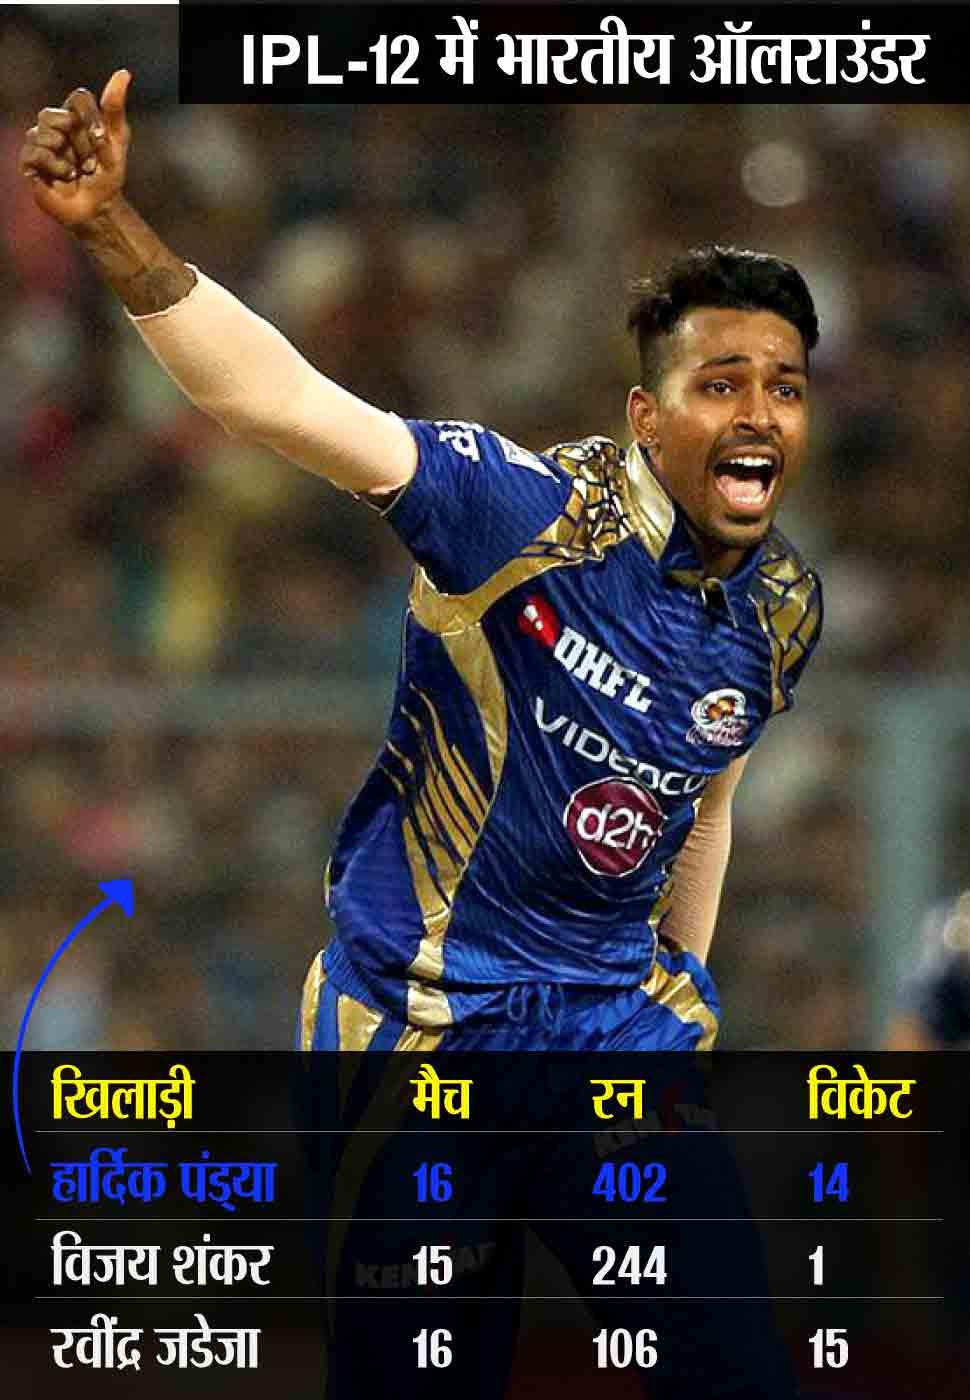 IPL Allrounder